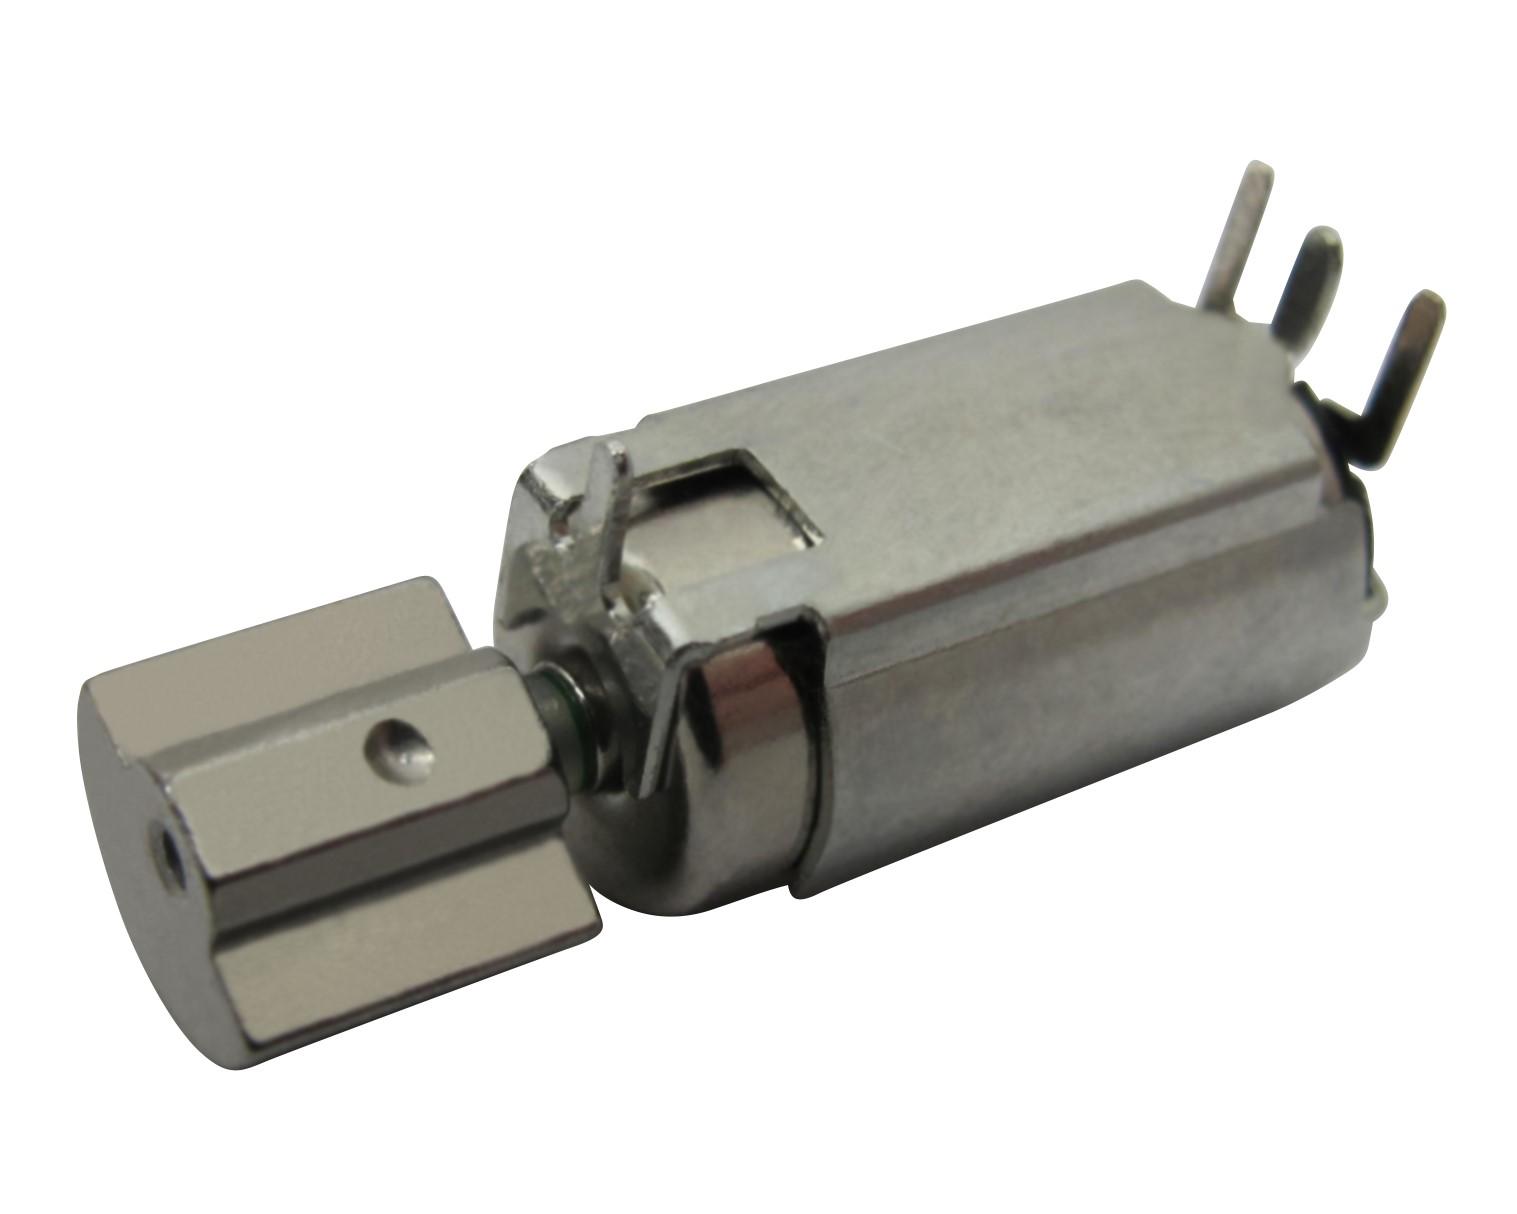 Z6DC1B0730091 Cylindrical Vibrator Motor